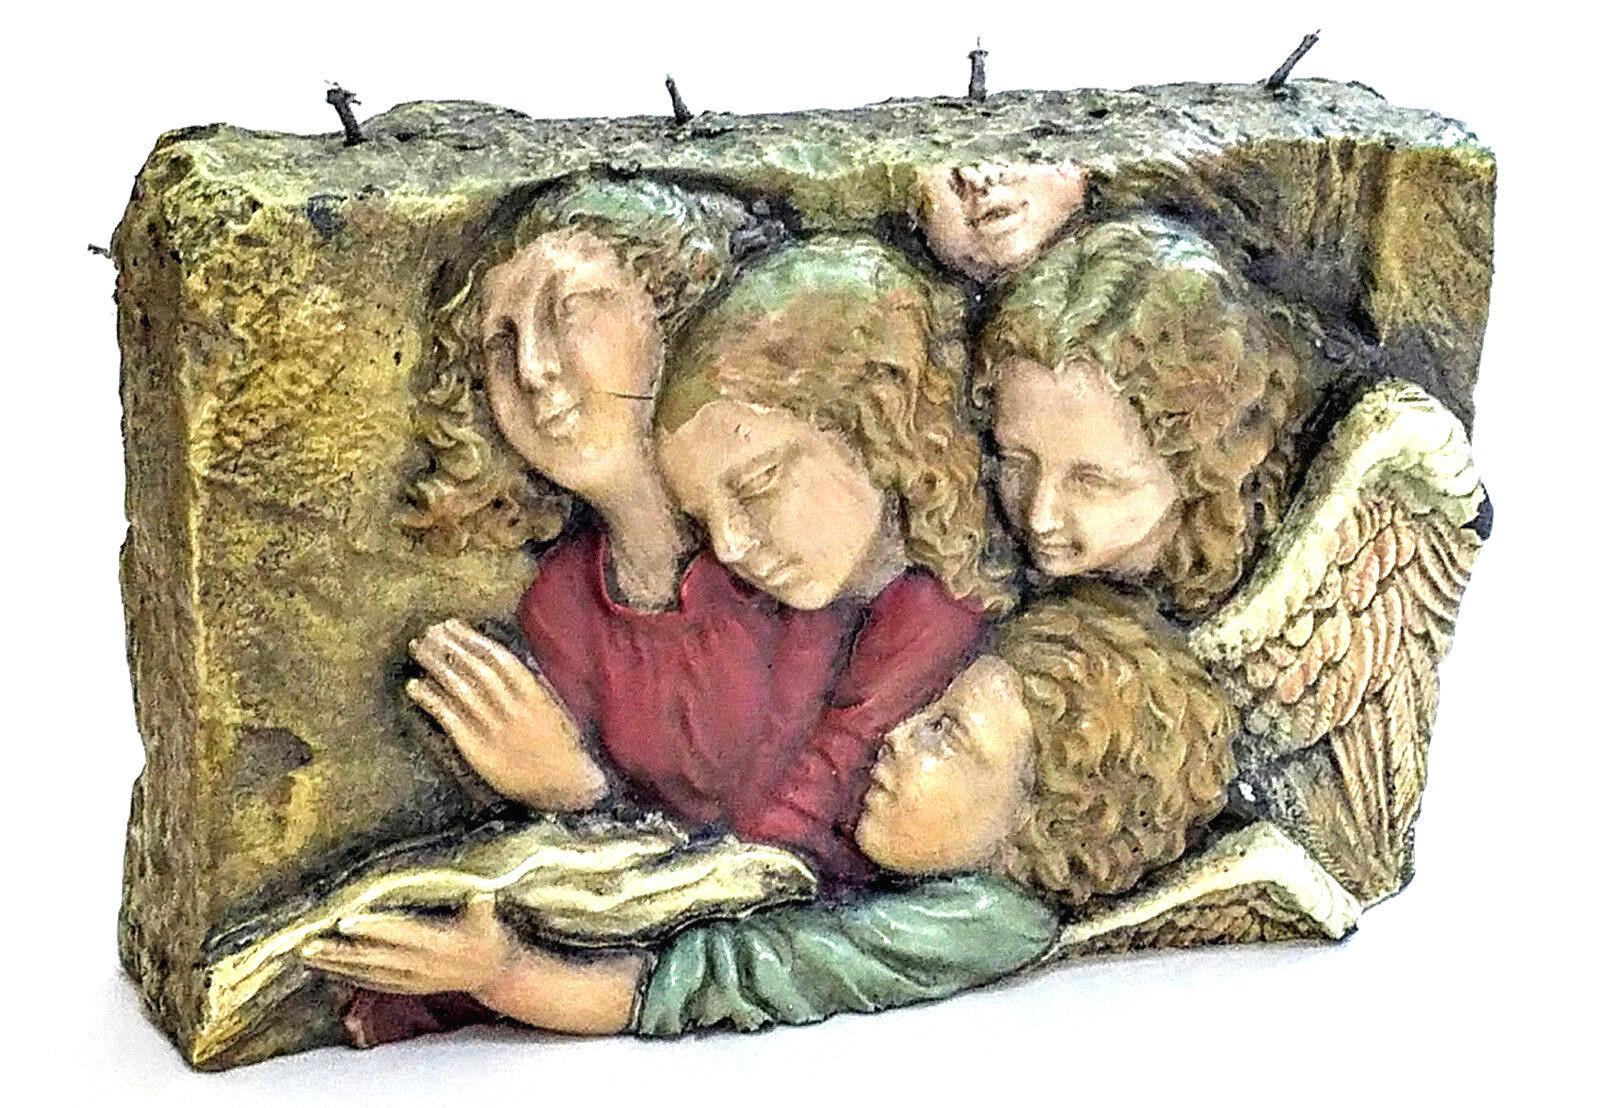 Candle Angels Large Home Decor Holiday Renaissance Bas Relief Sculpture  RARE